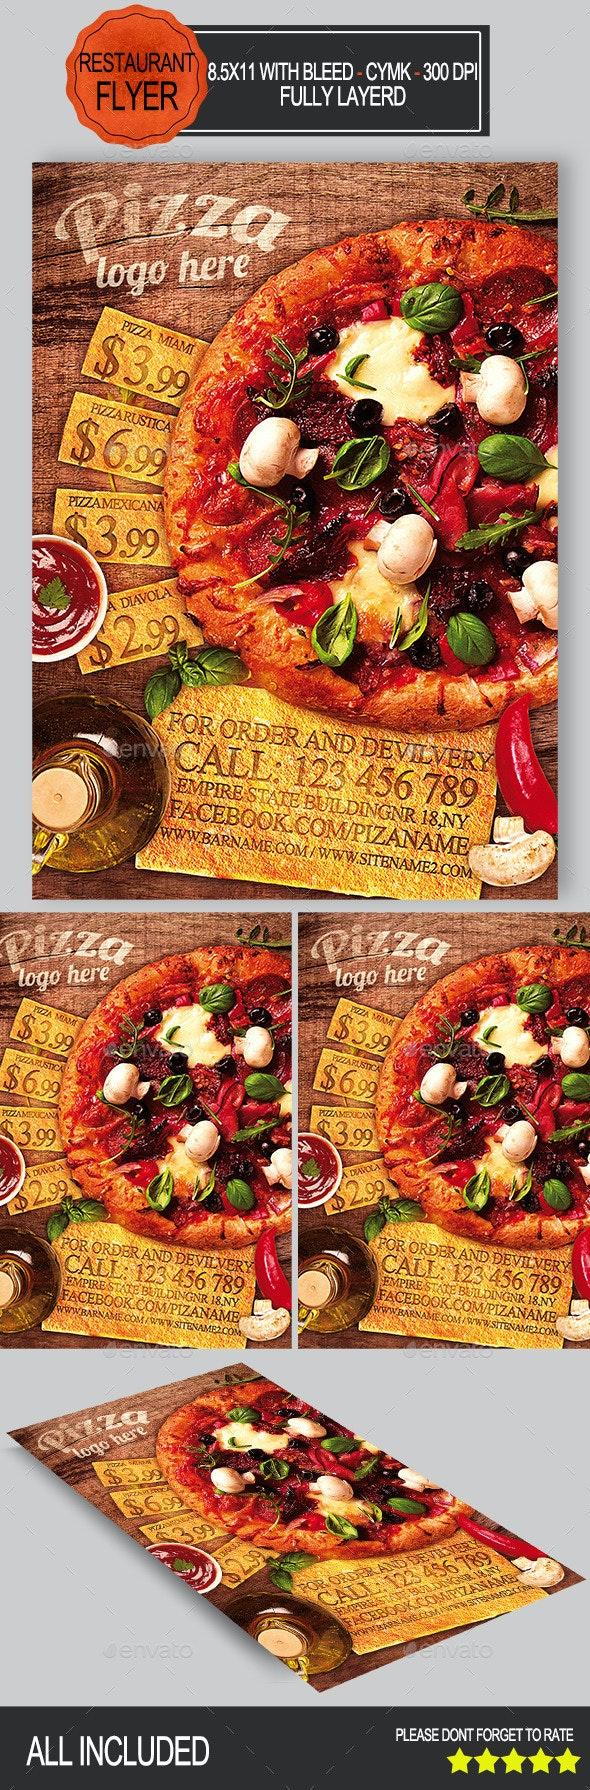 Pizza Restaurant Flyer - Restaurant Flyers